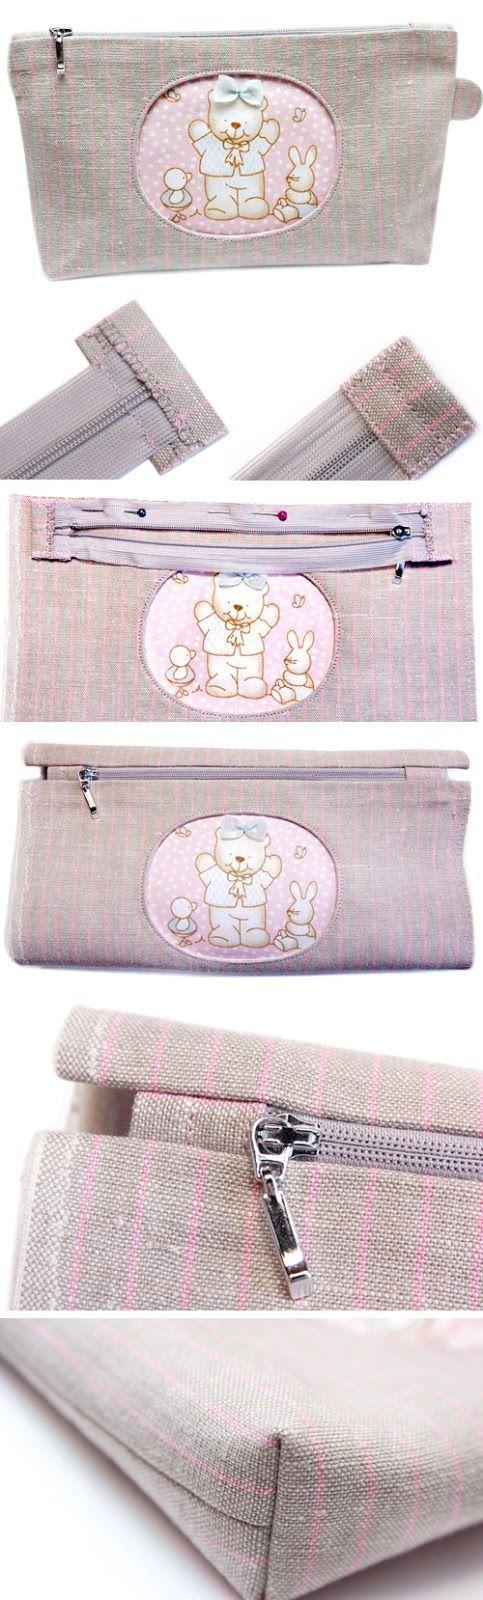 Zippered Cosmetic Bag Appliqué Teddy Bear. Tutorial DIY in Pictures.   http://www.handmadiya.com/2015/11/cosmetic-bag-with-applique-bear.html